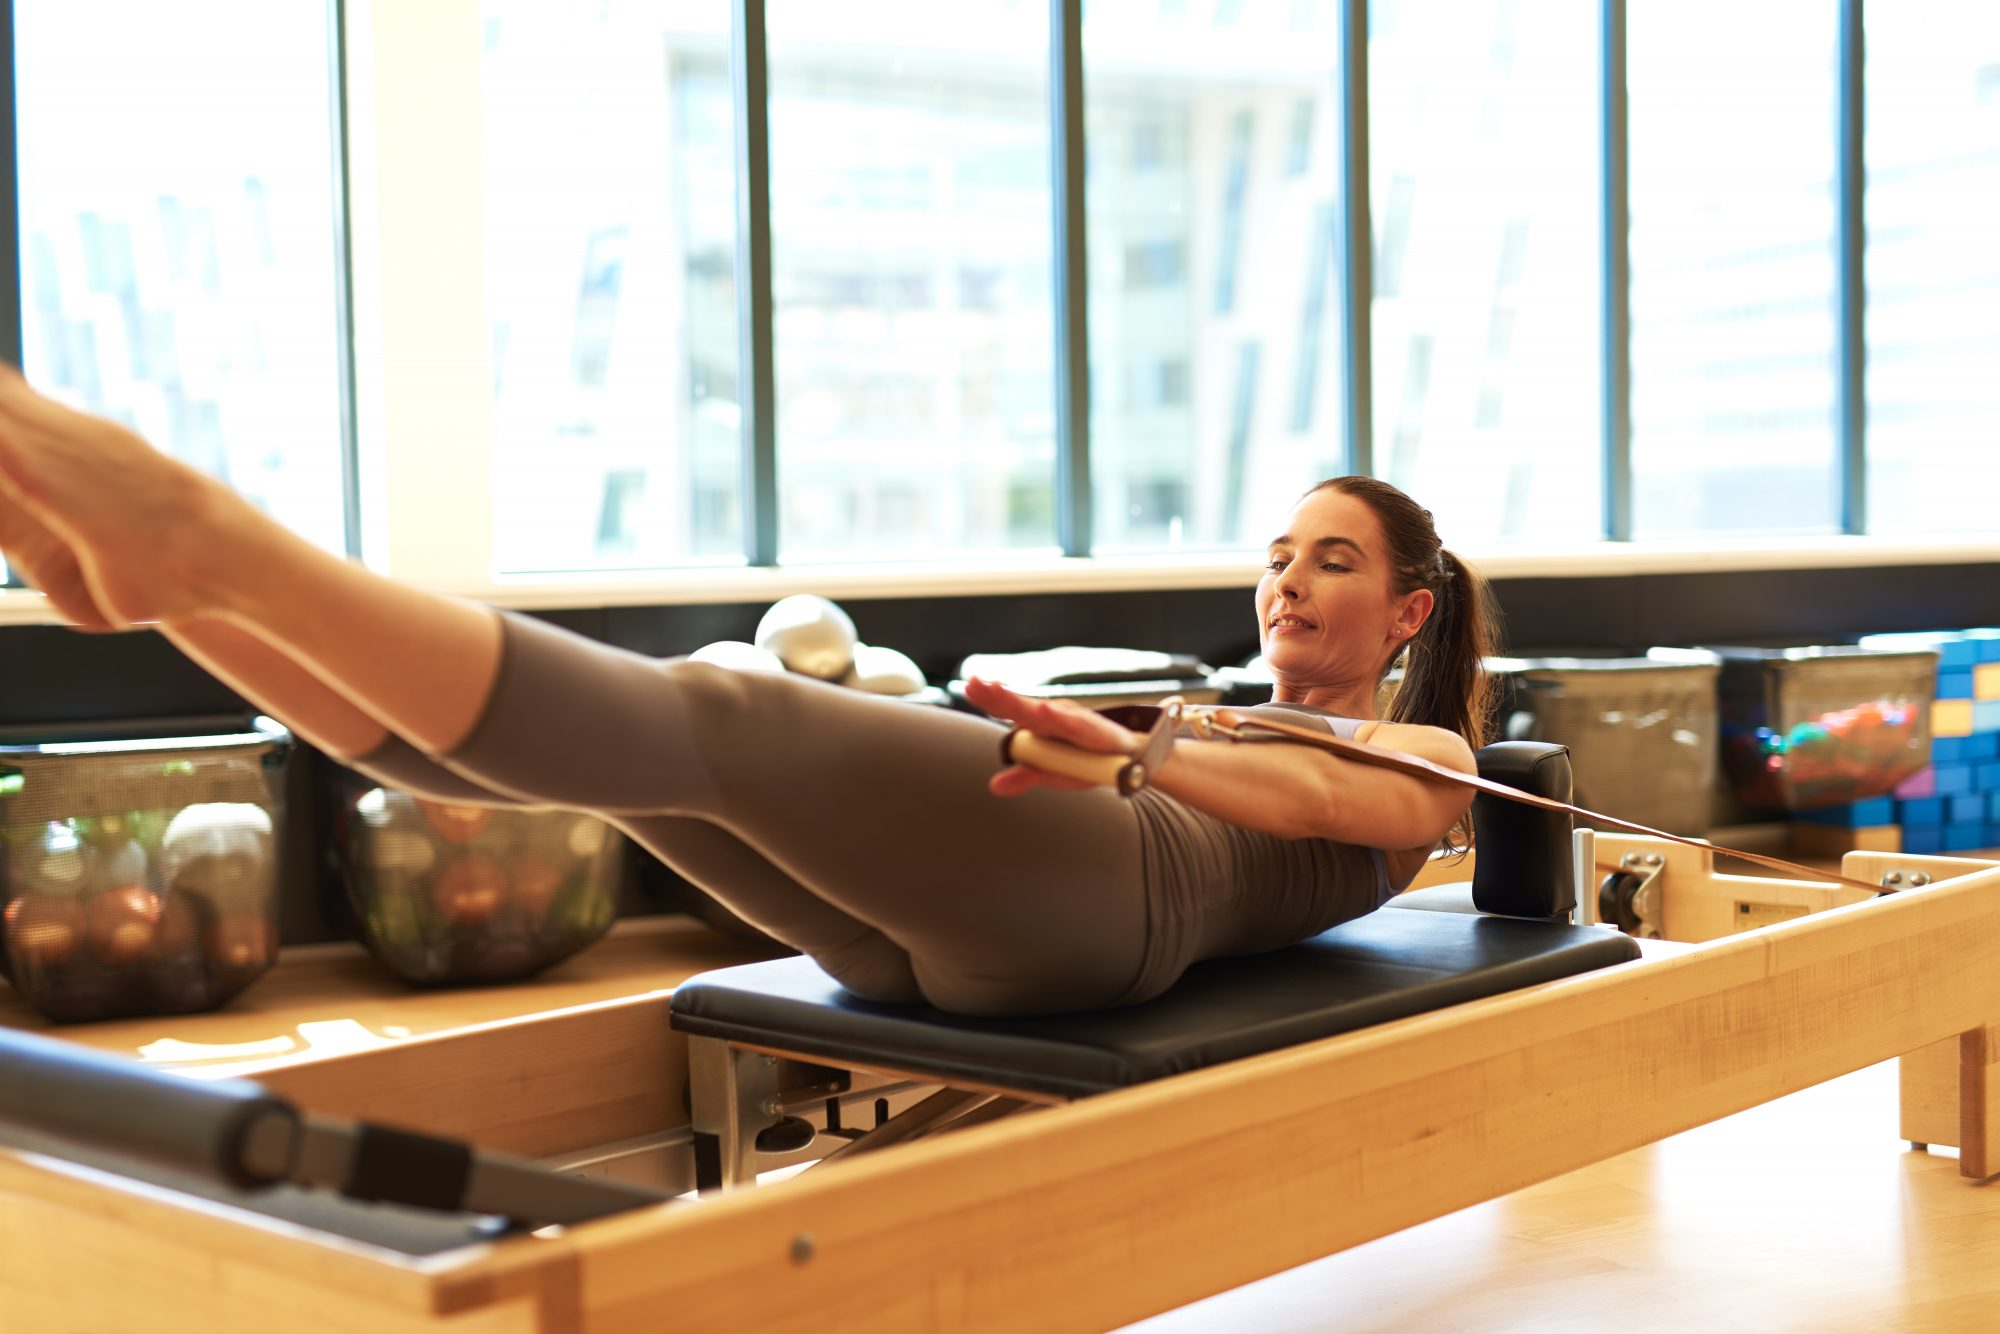 Lumen Pilates